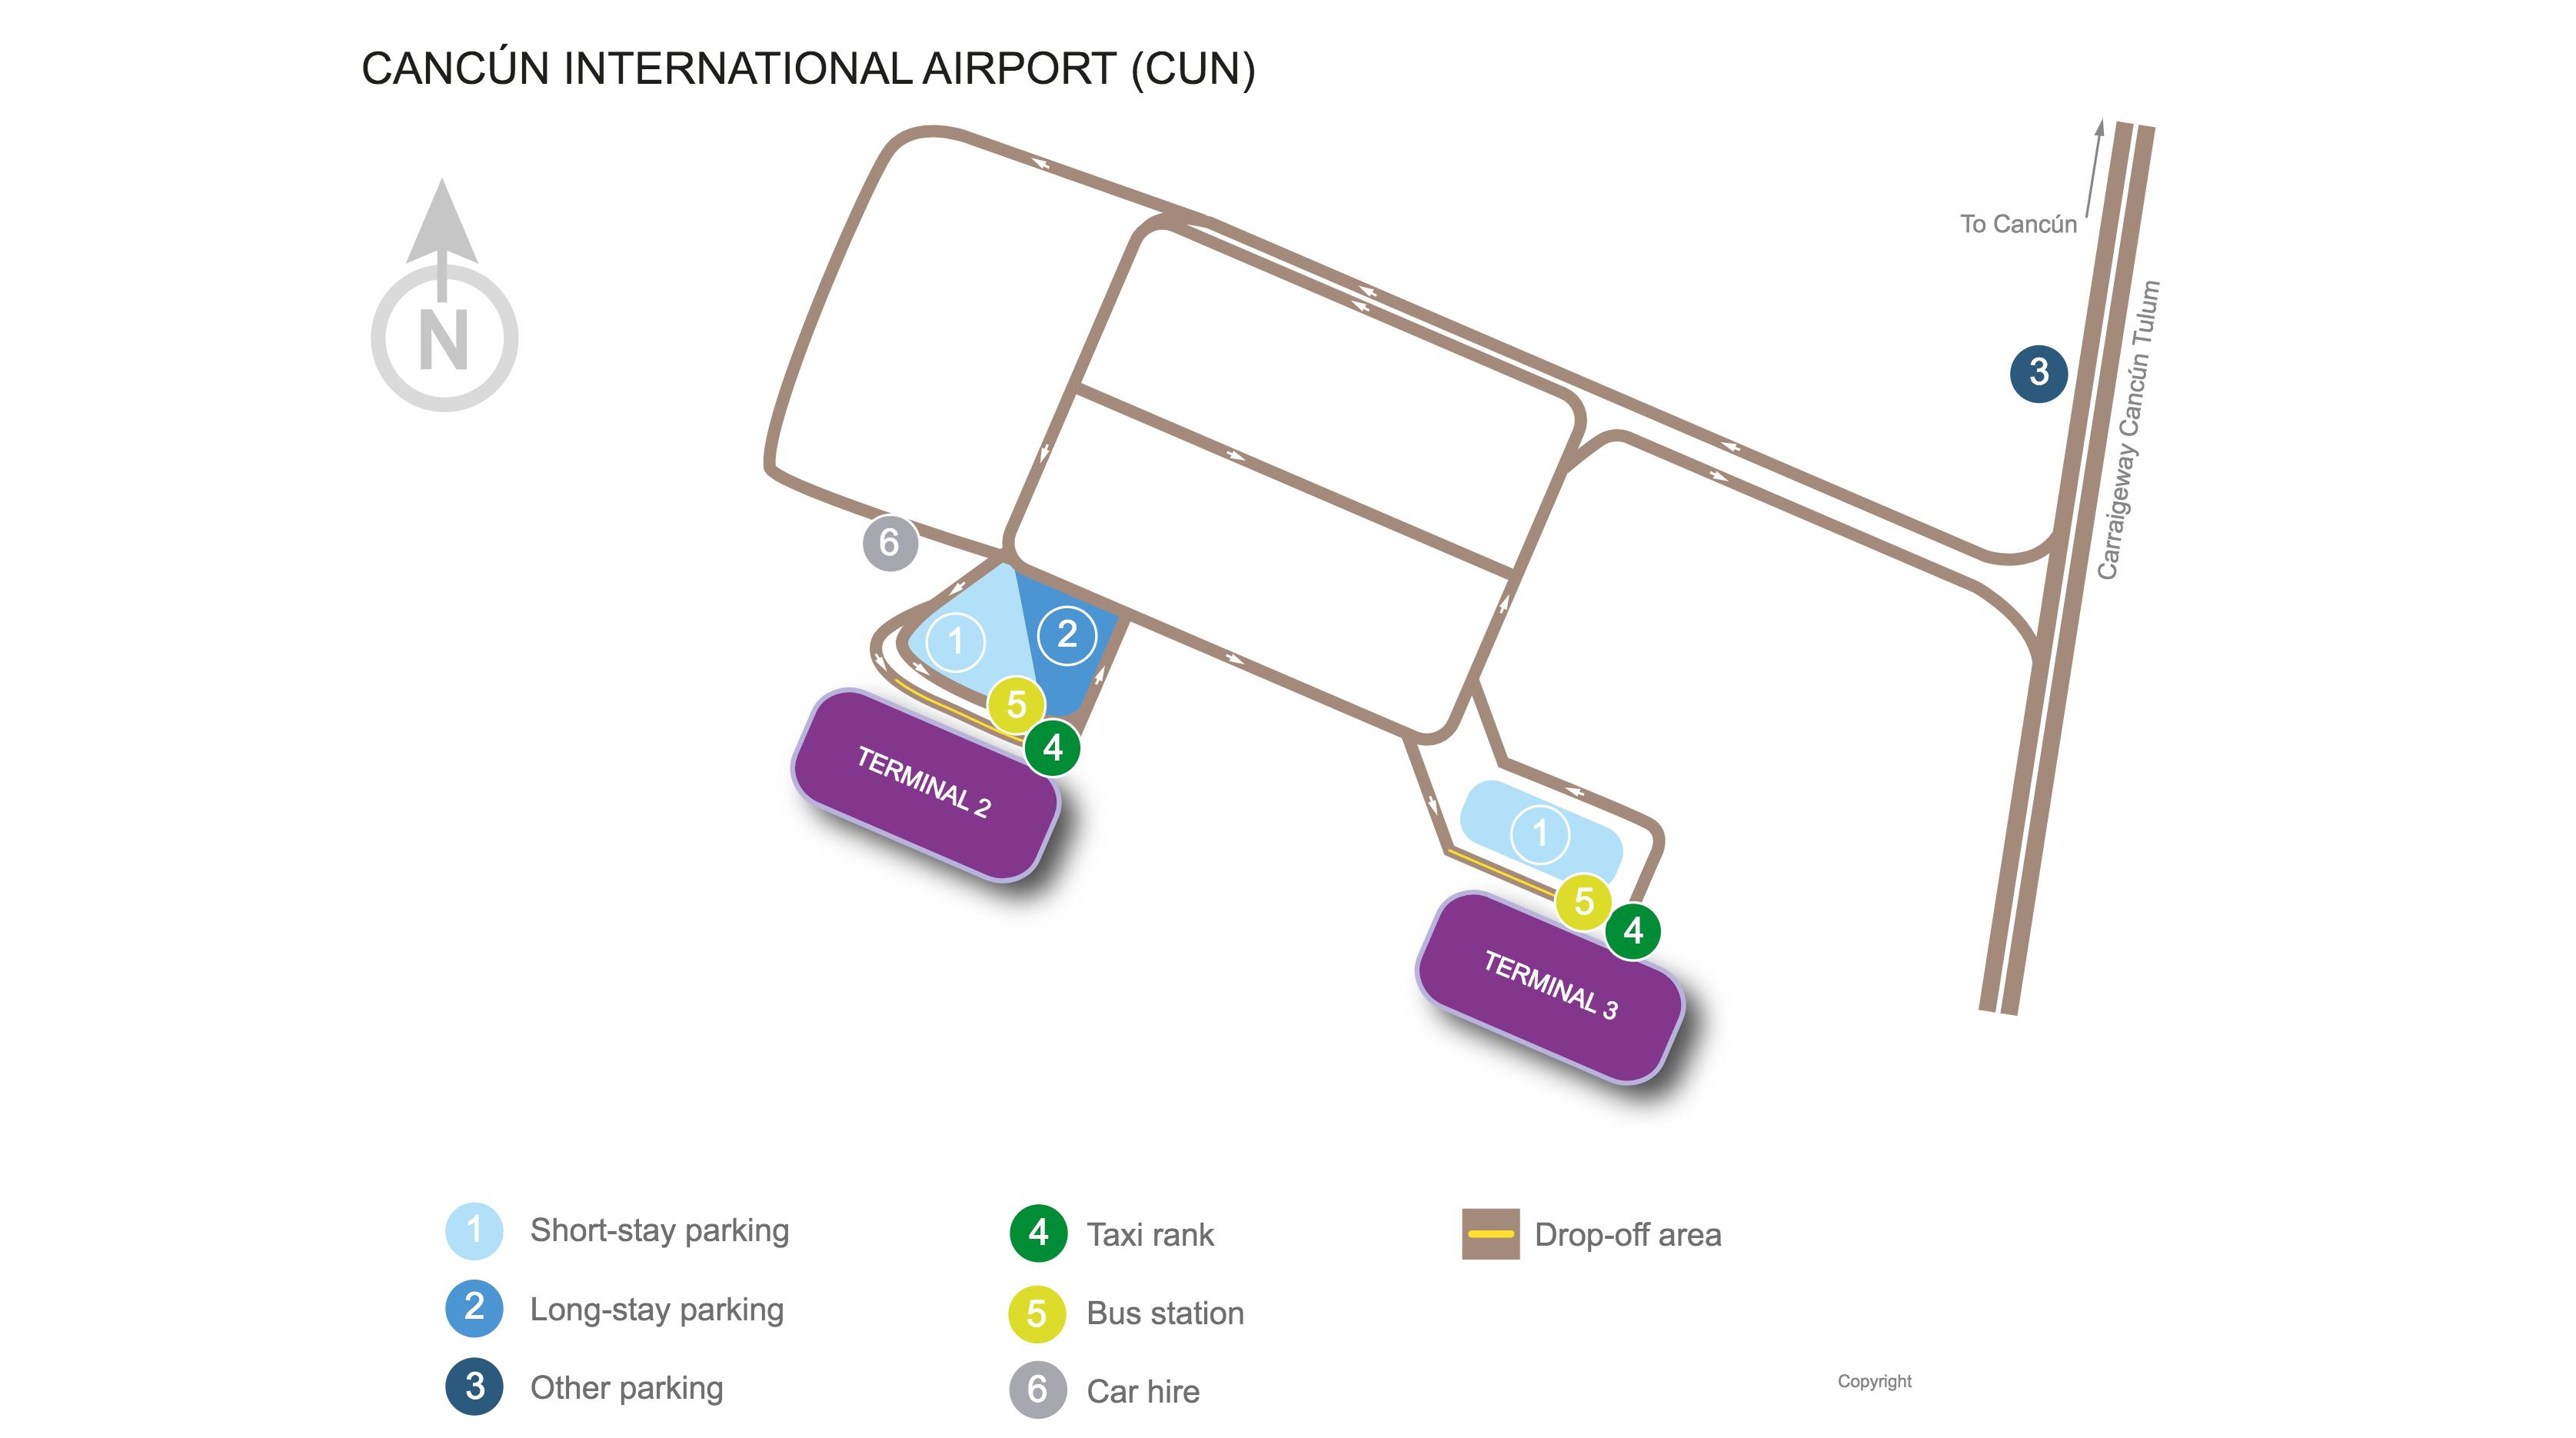 Cancún International Airport map